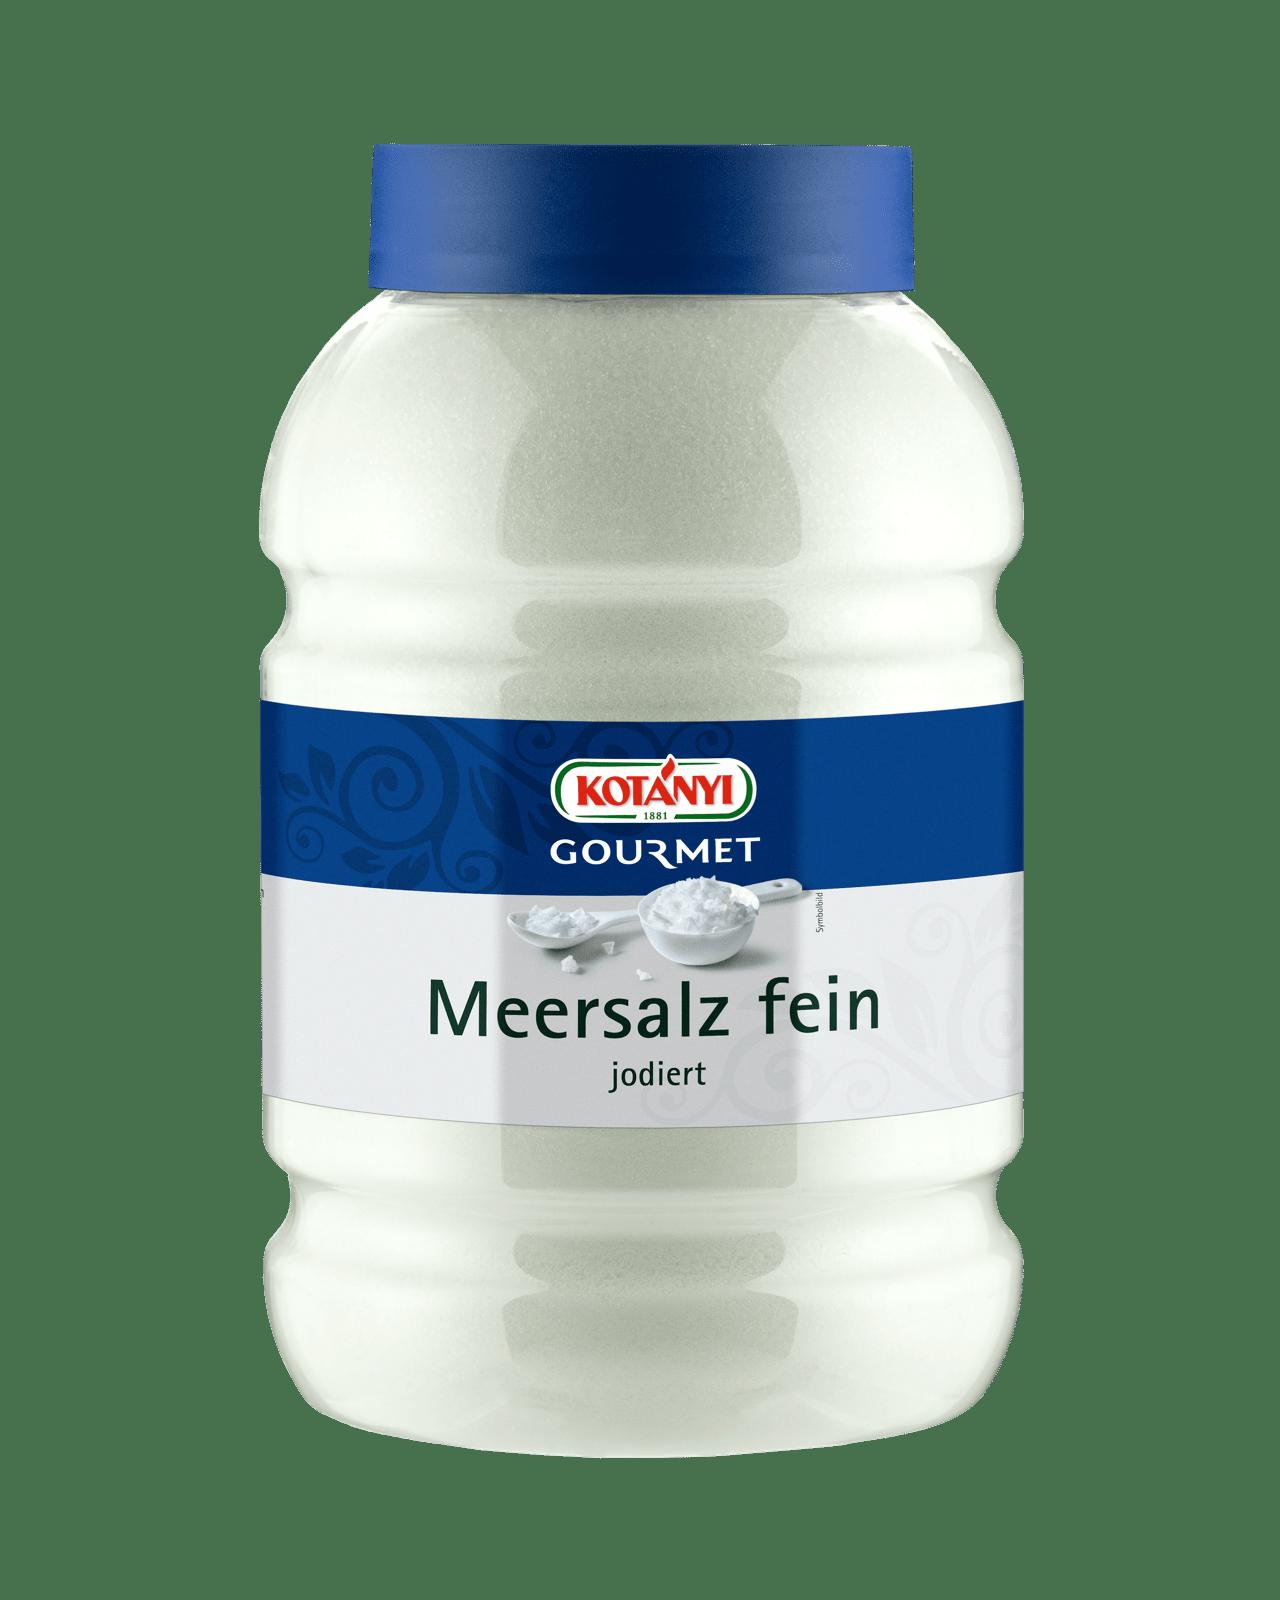 Kotányi Gourmet Meersalz fein jodiert in der 3000ccm Dose